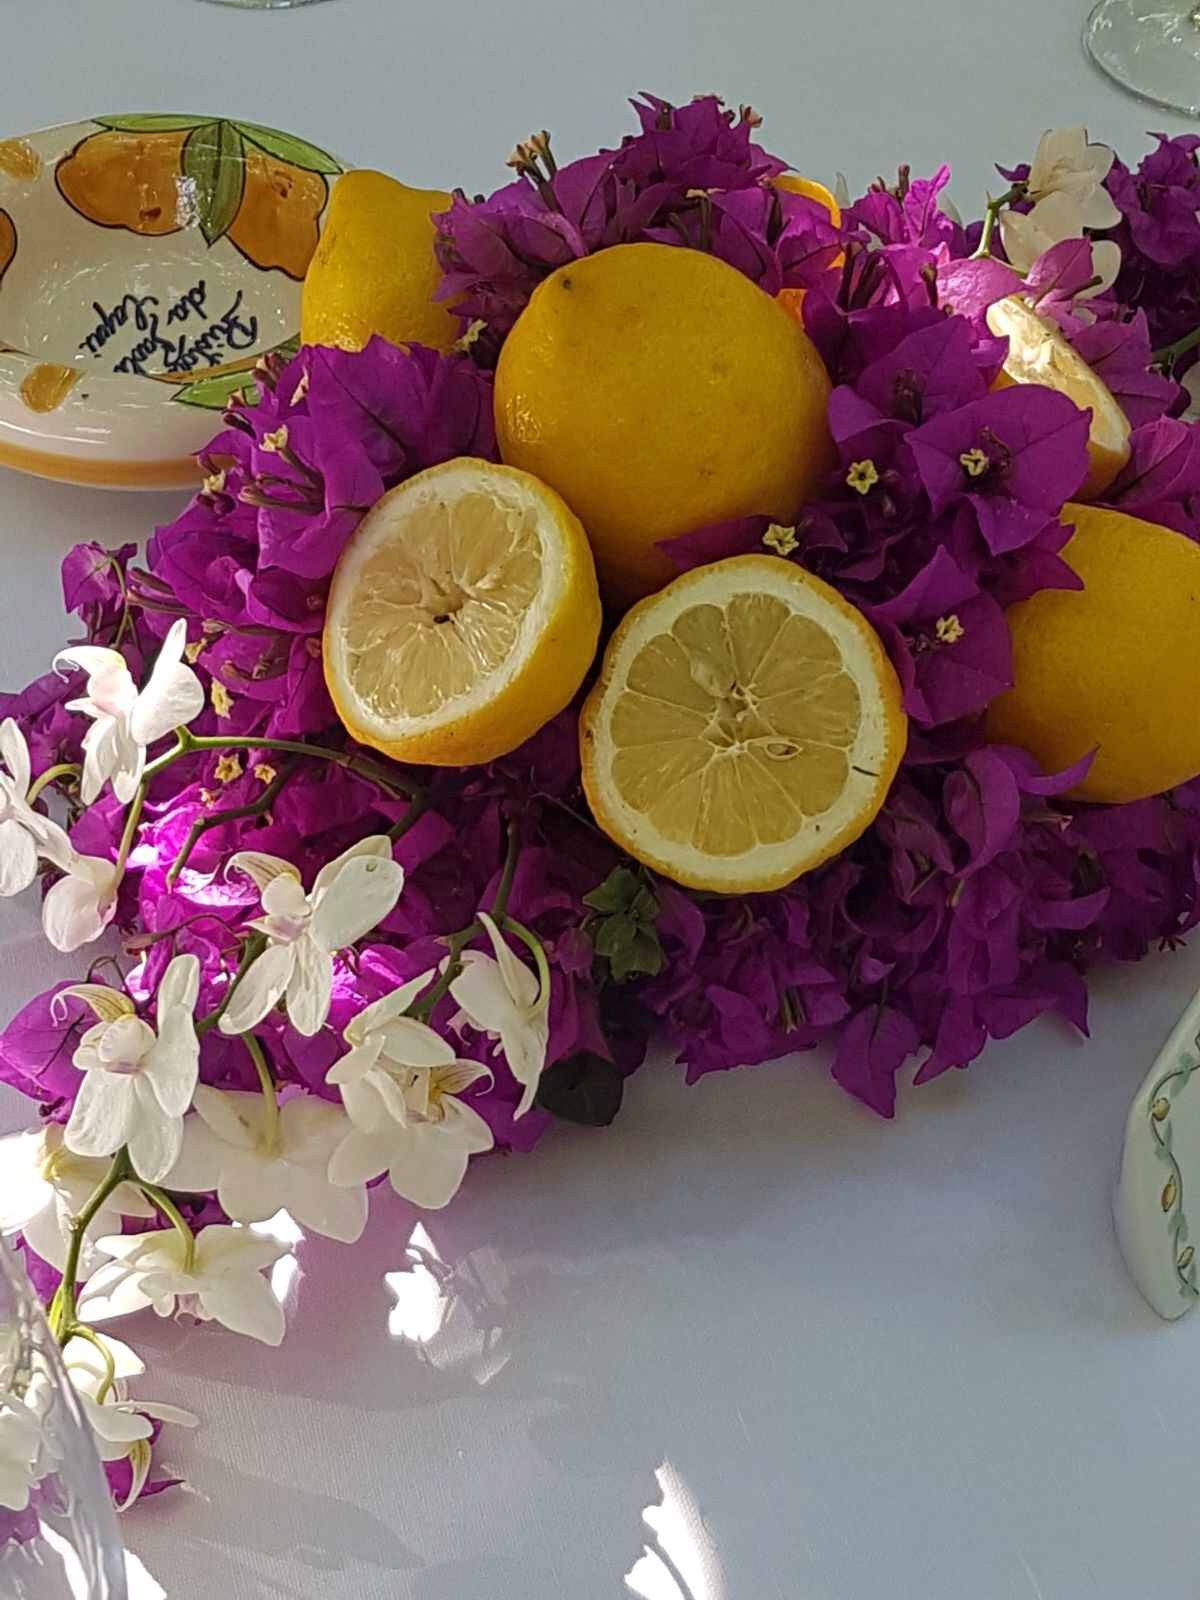 https://www.weddingamalfi.com/wp-content/uploads/Nathalie-and-Benjamin-wedding-day-in-Positano-2.jpg